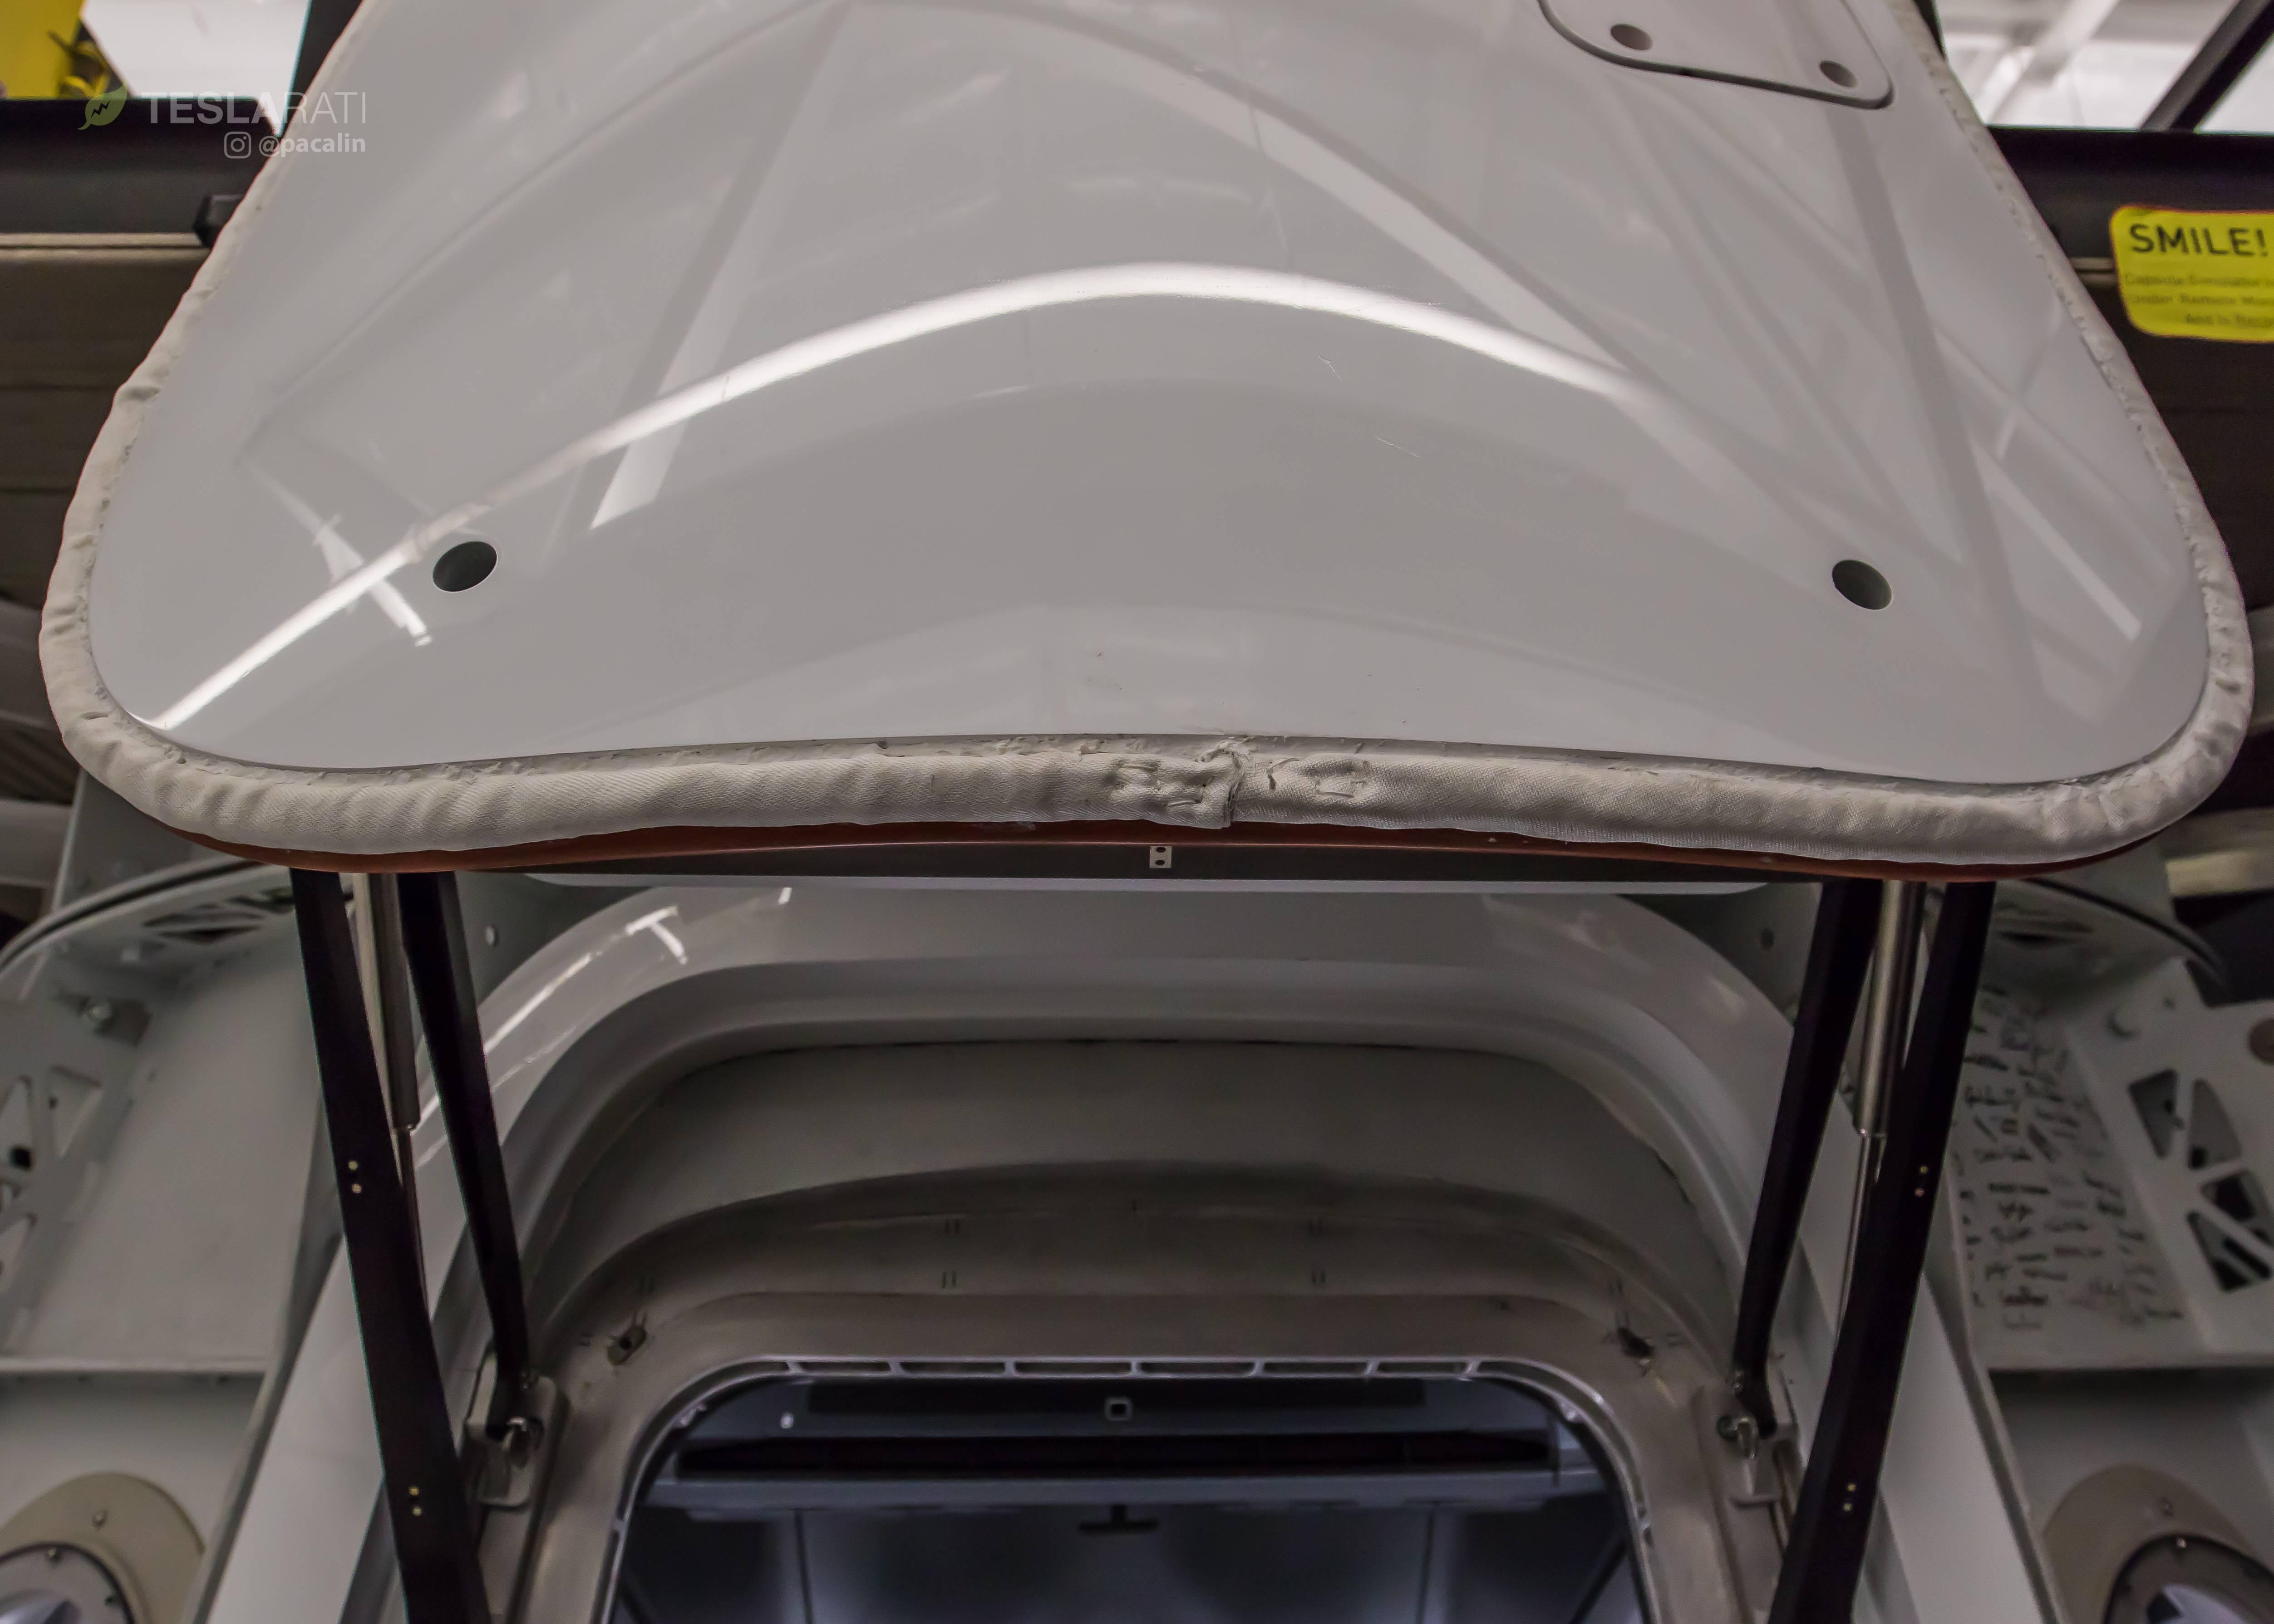 Crew Dragon simulator hatch 081318 (SpaceX) 4